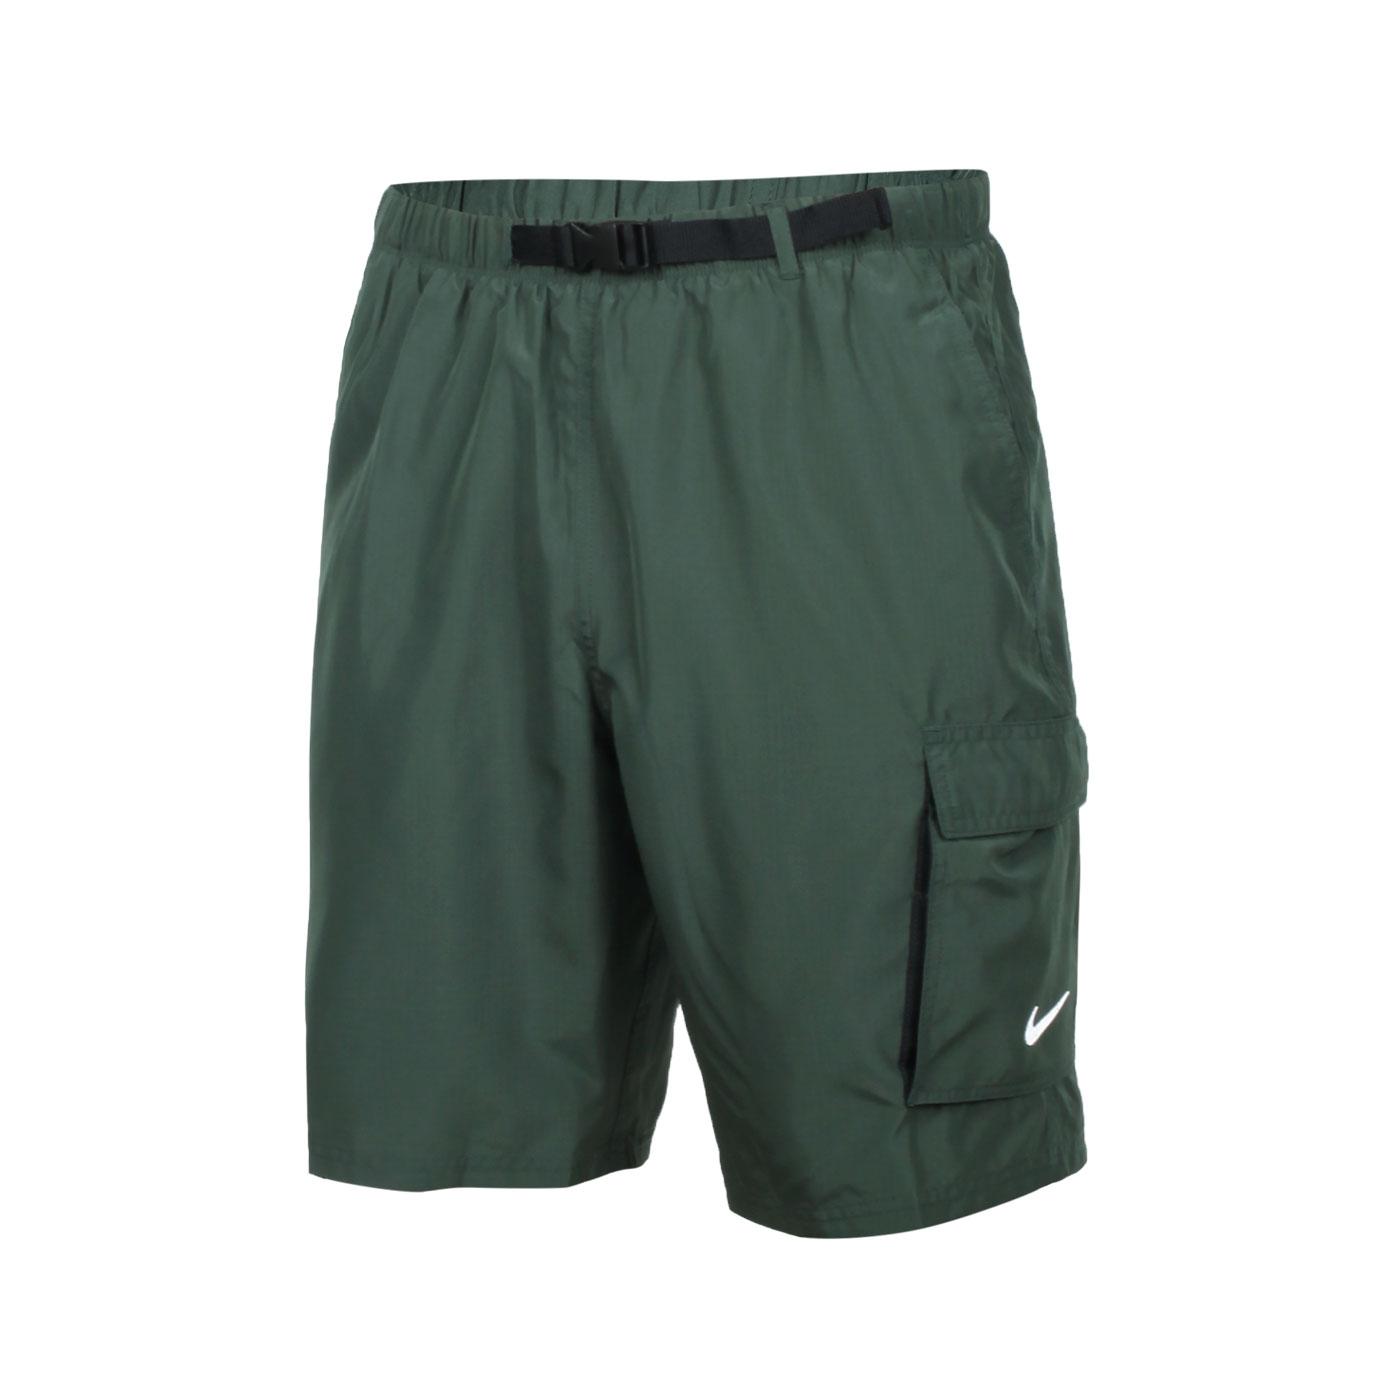 NIKE 男款成人九吋海灘褲 NESSB521-303 - 軍綠白